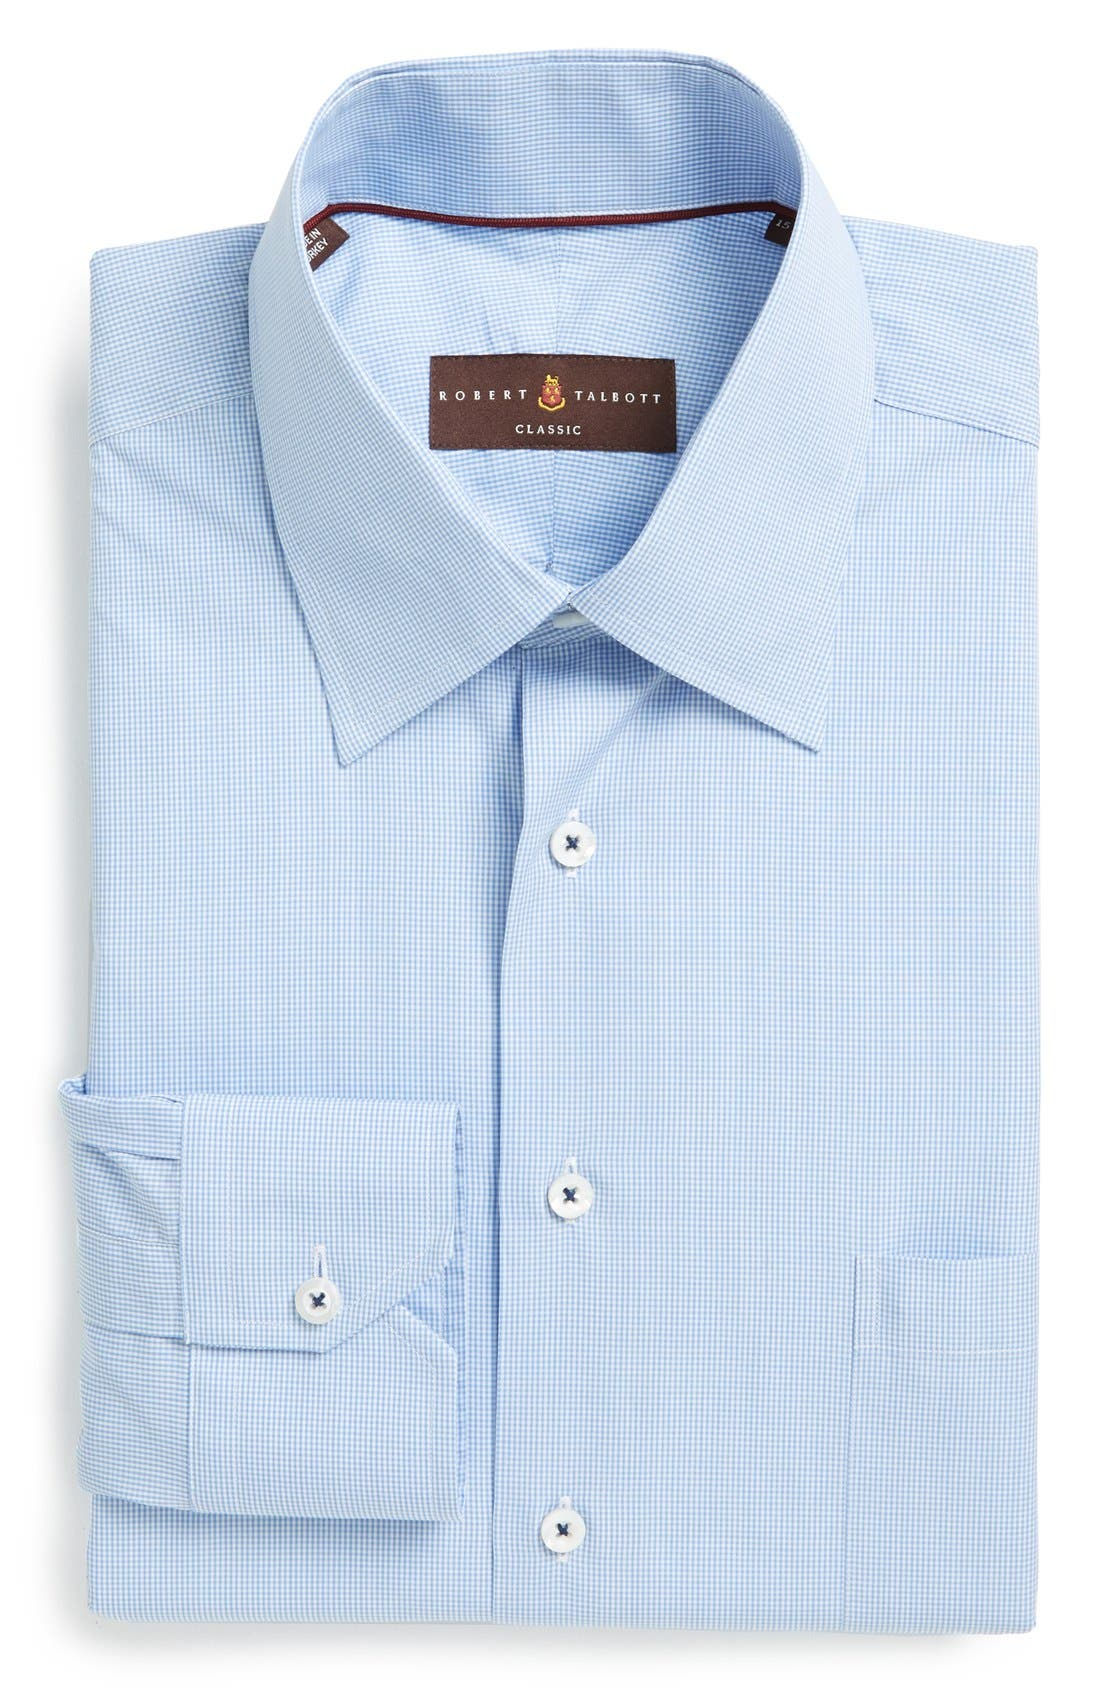 Main Image - Robert Talbott Classic Fit Micro Gingham Dress Shirt